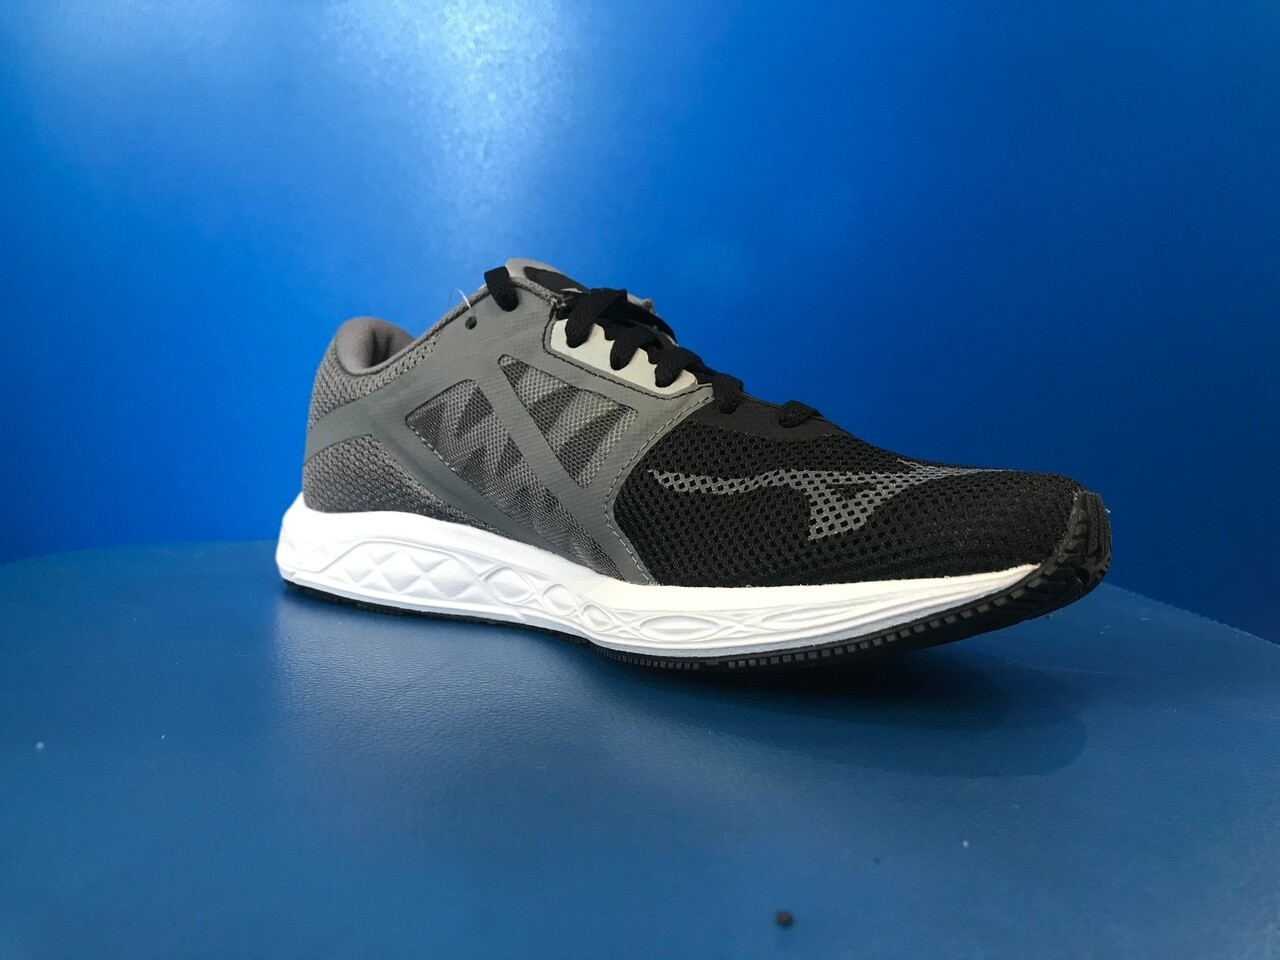 Mizuno Wave Sonic 2 Running Shoes Mens US13 (New) (EC795)